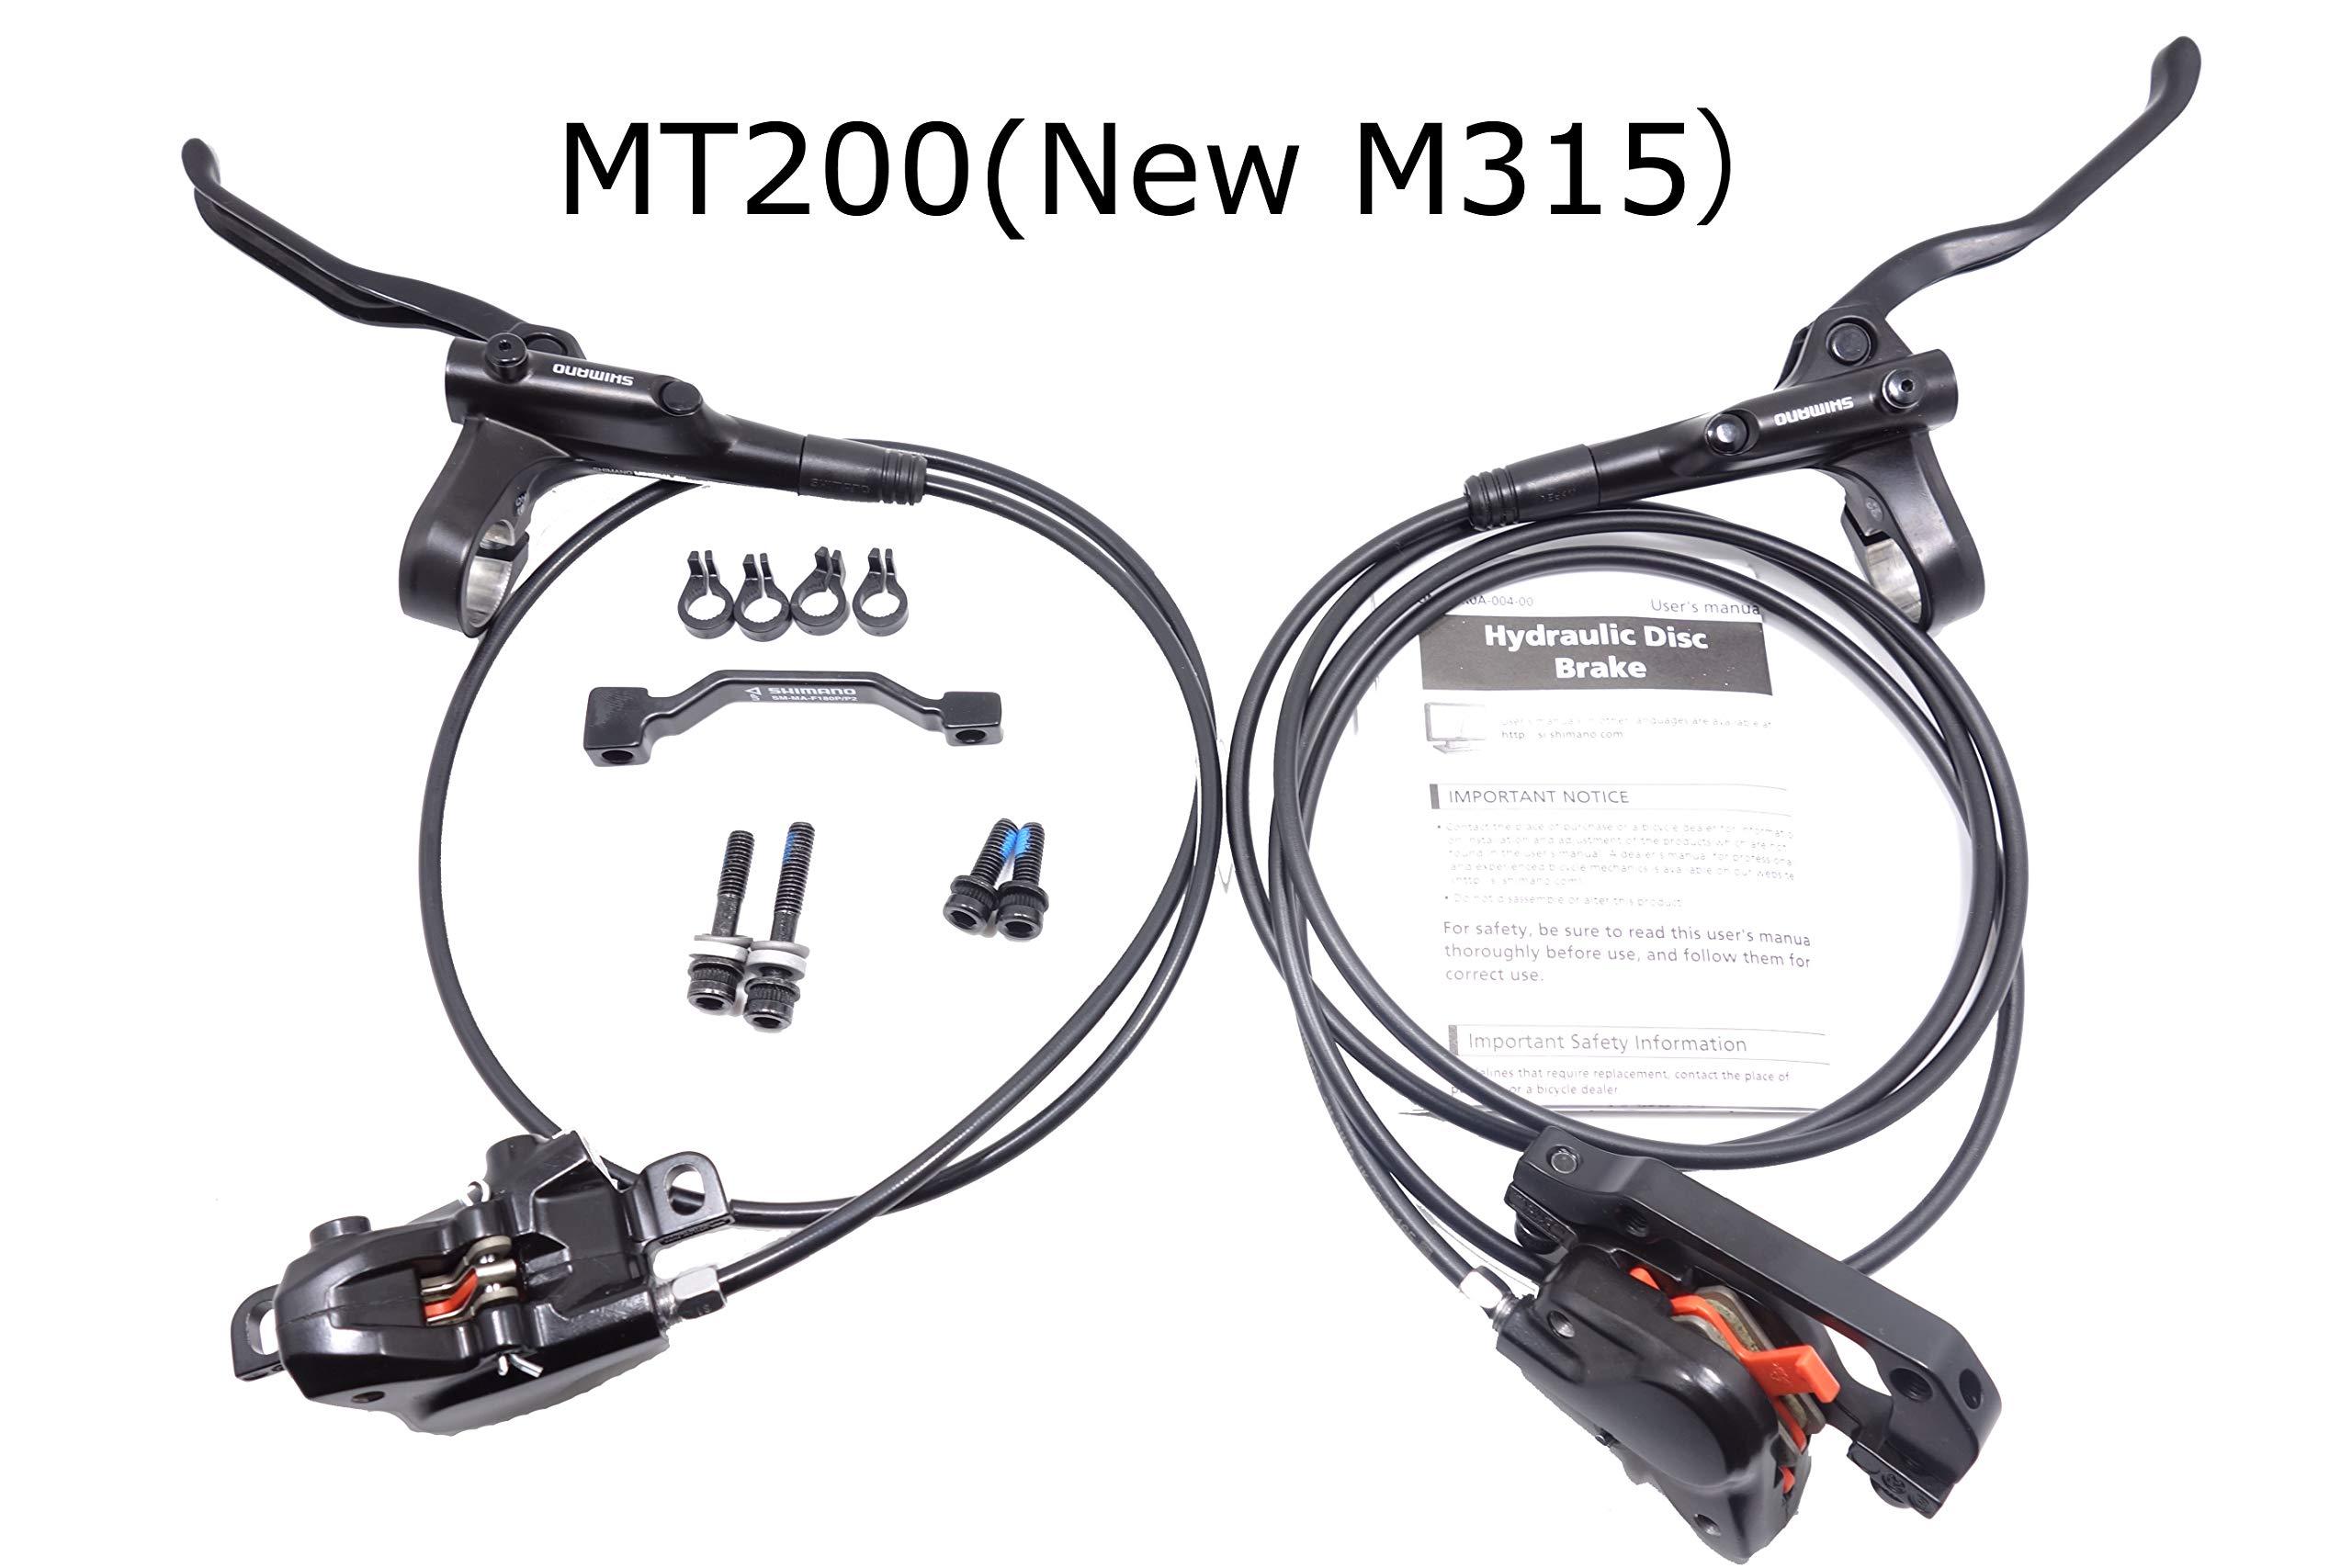 JGbike Shimano M315 MT200 MTB Hydraulic Disc Brakes Set Kits for Mountain Bike - Left/Rear 800mm Right/Front 1650mm by JGbike